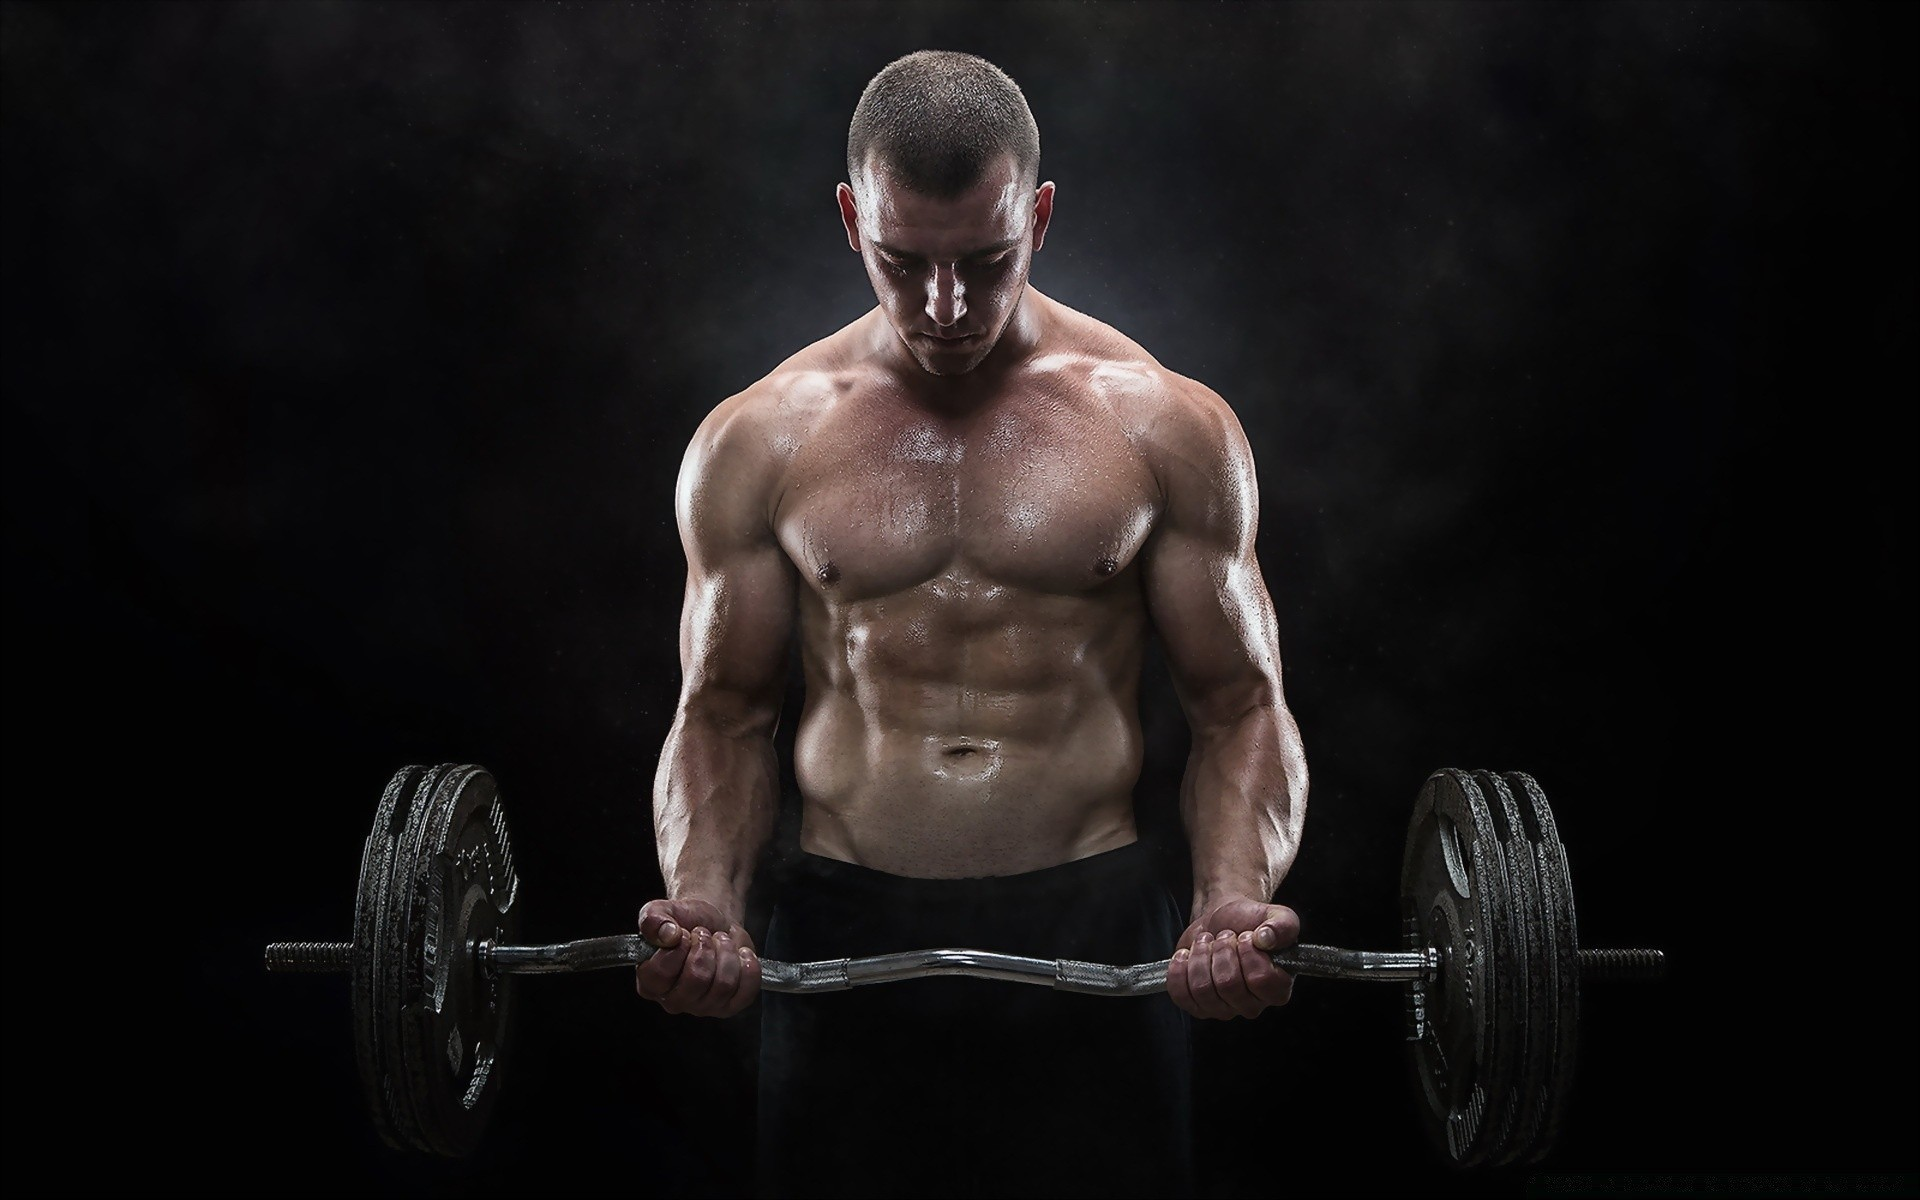 картинки на рабочий стол мотивация спорт